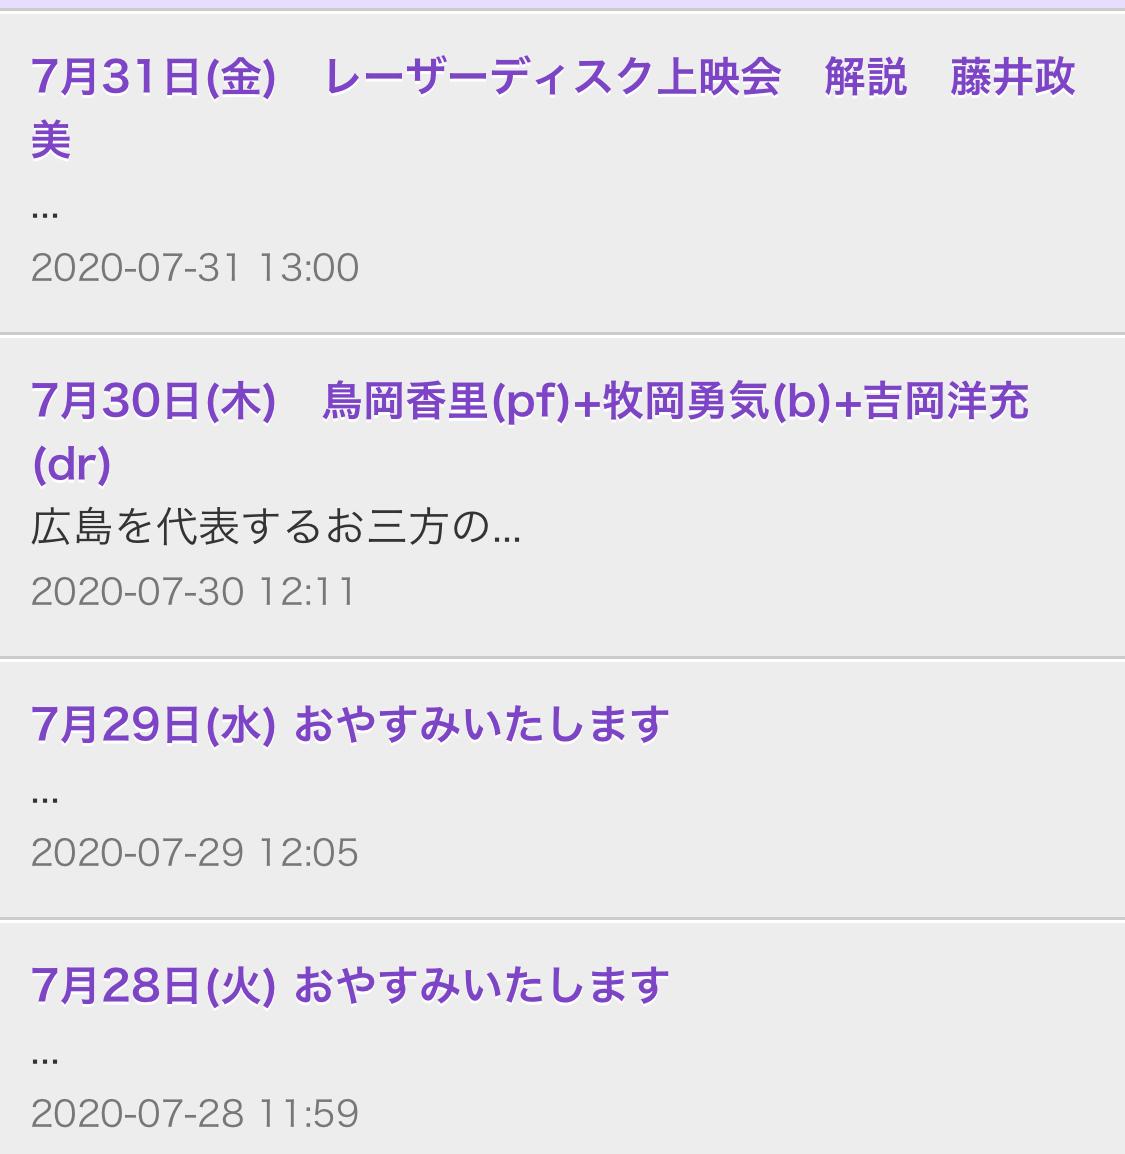 Jazzlive Cominジャズライブカミン 広島 8月のスケジュール_b0115606_10375977.jpeg